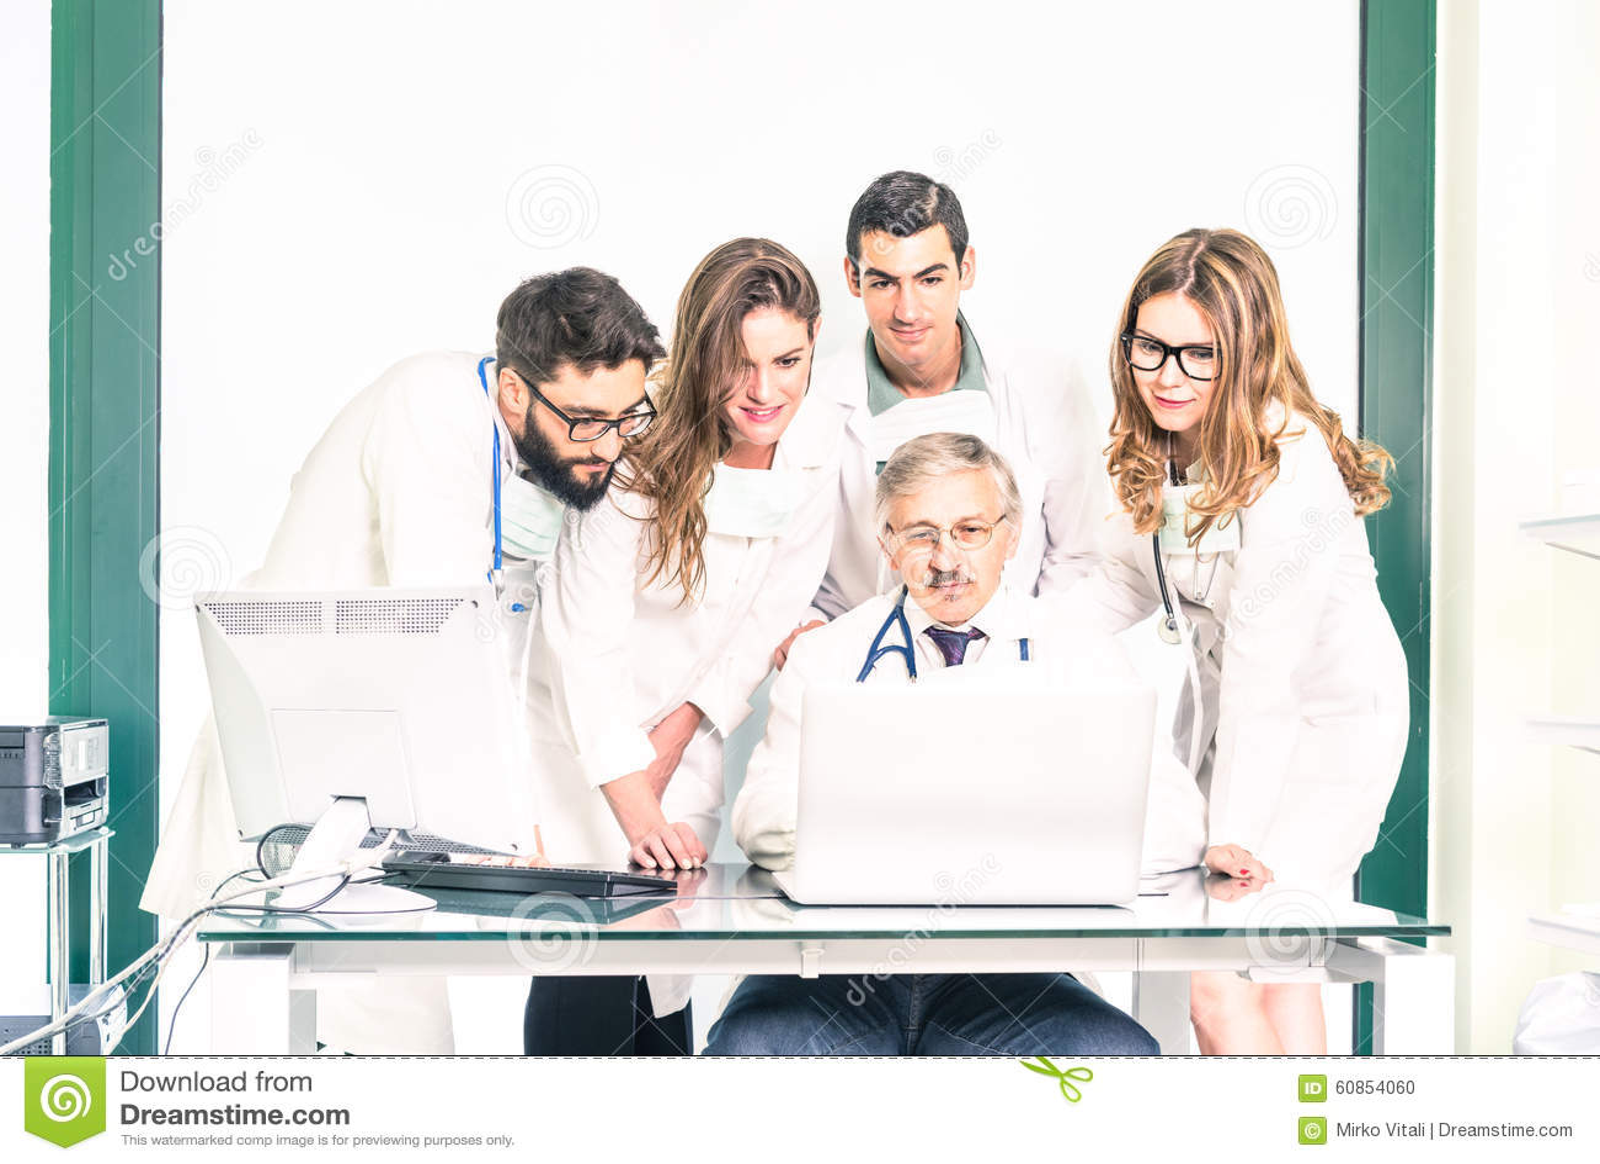 Gruppe junge Medizinstudenten mit älterem Doktor an der Klinik